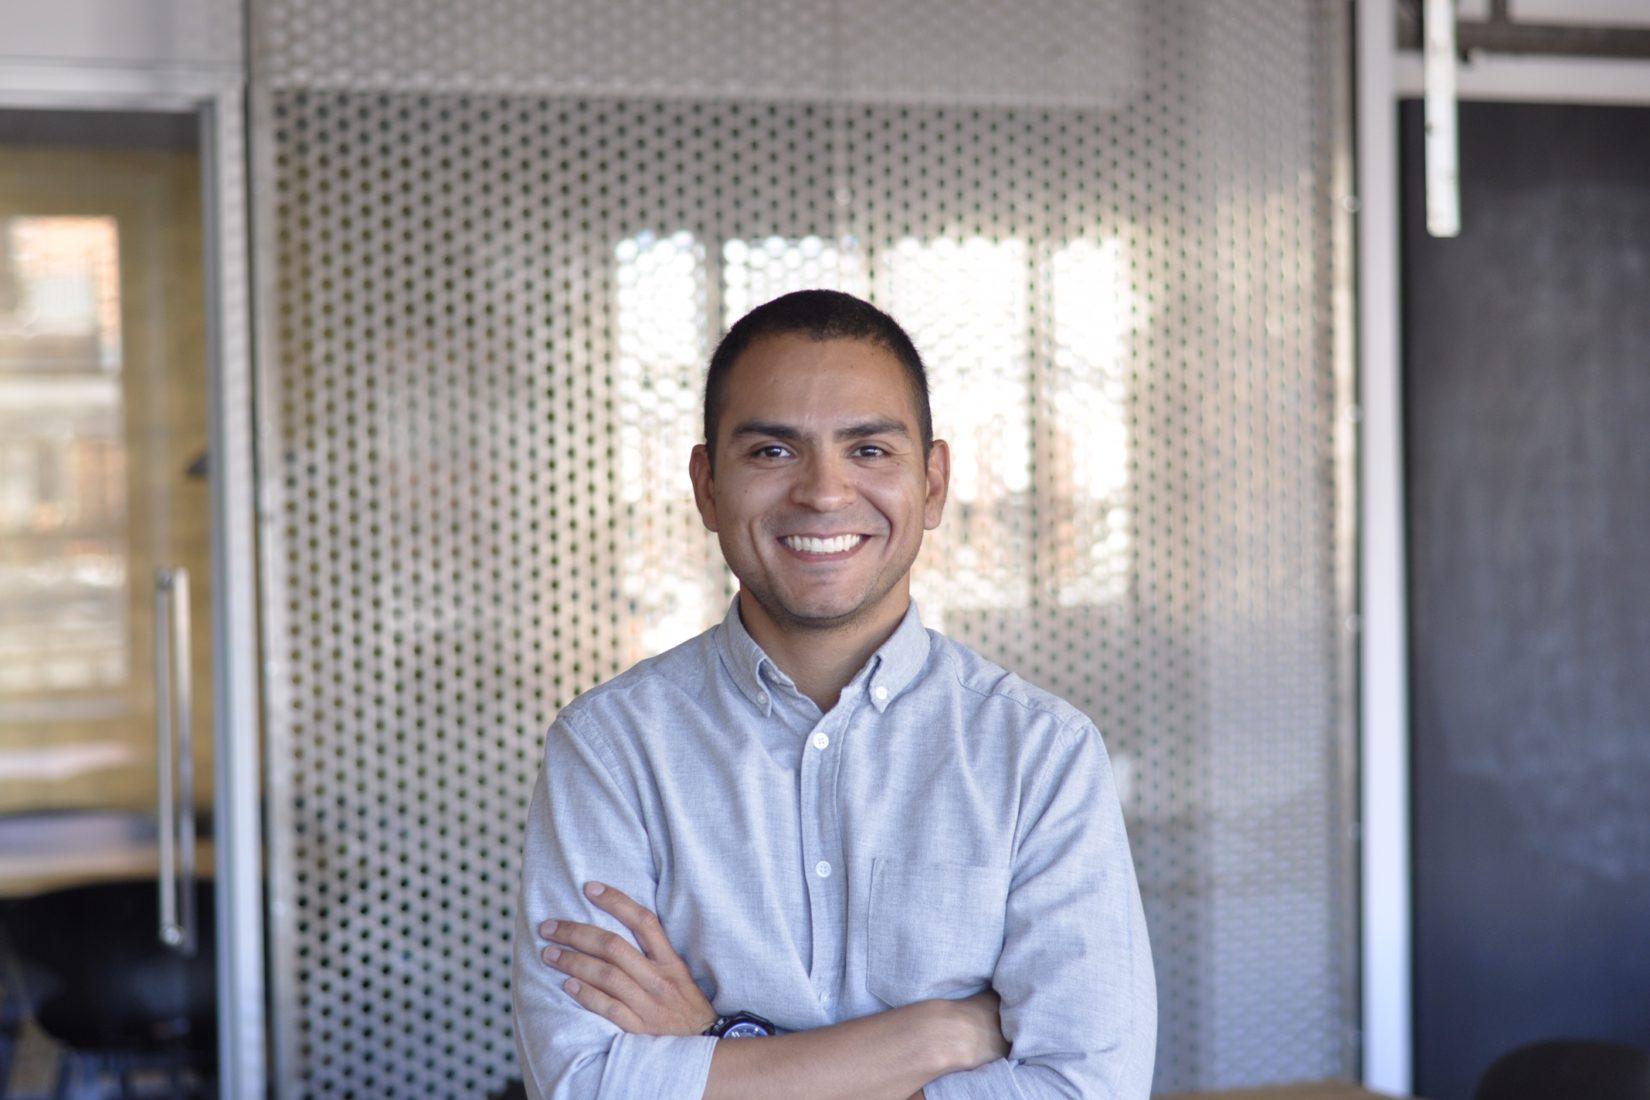 Previous SI scholarship holder Thiago Ferreira in an office